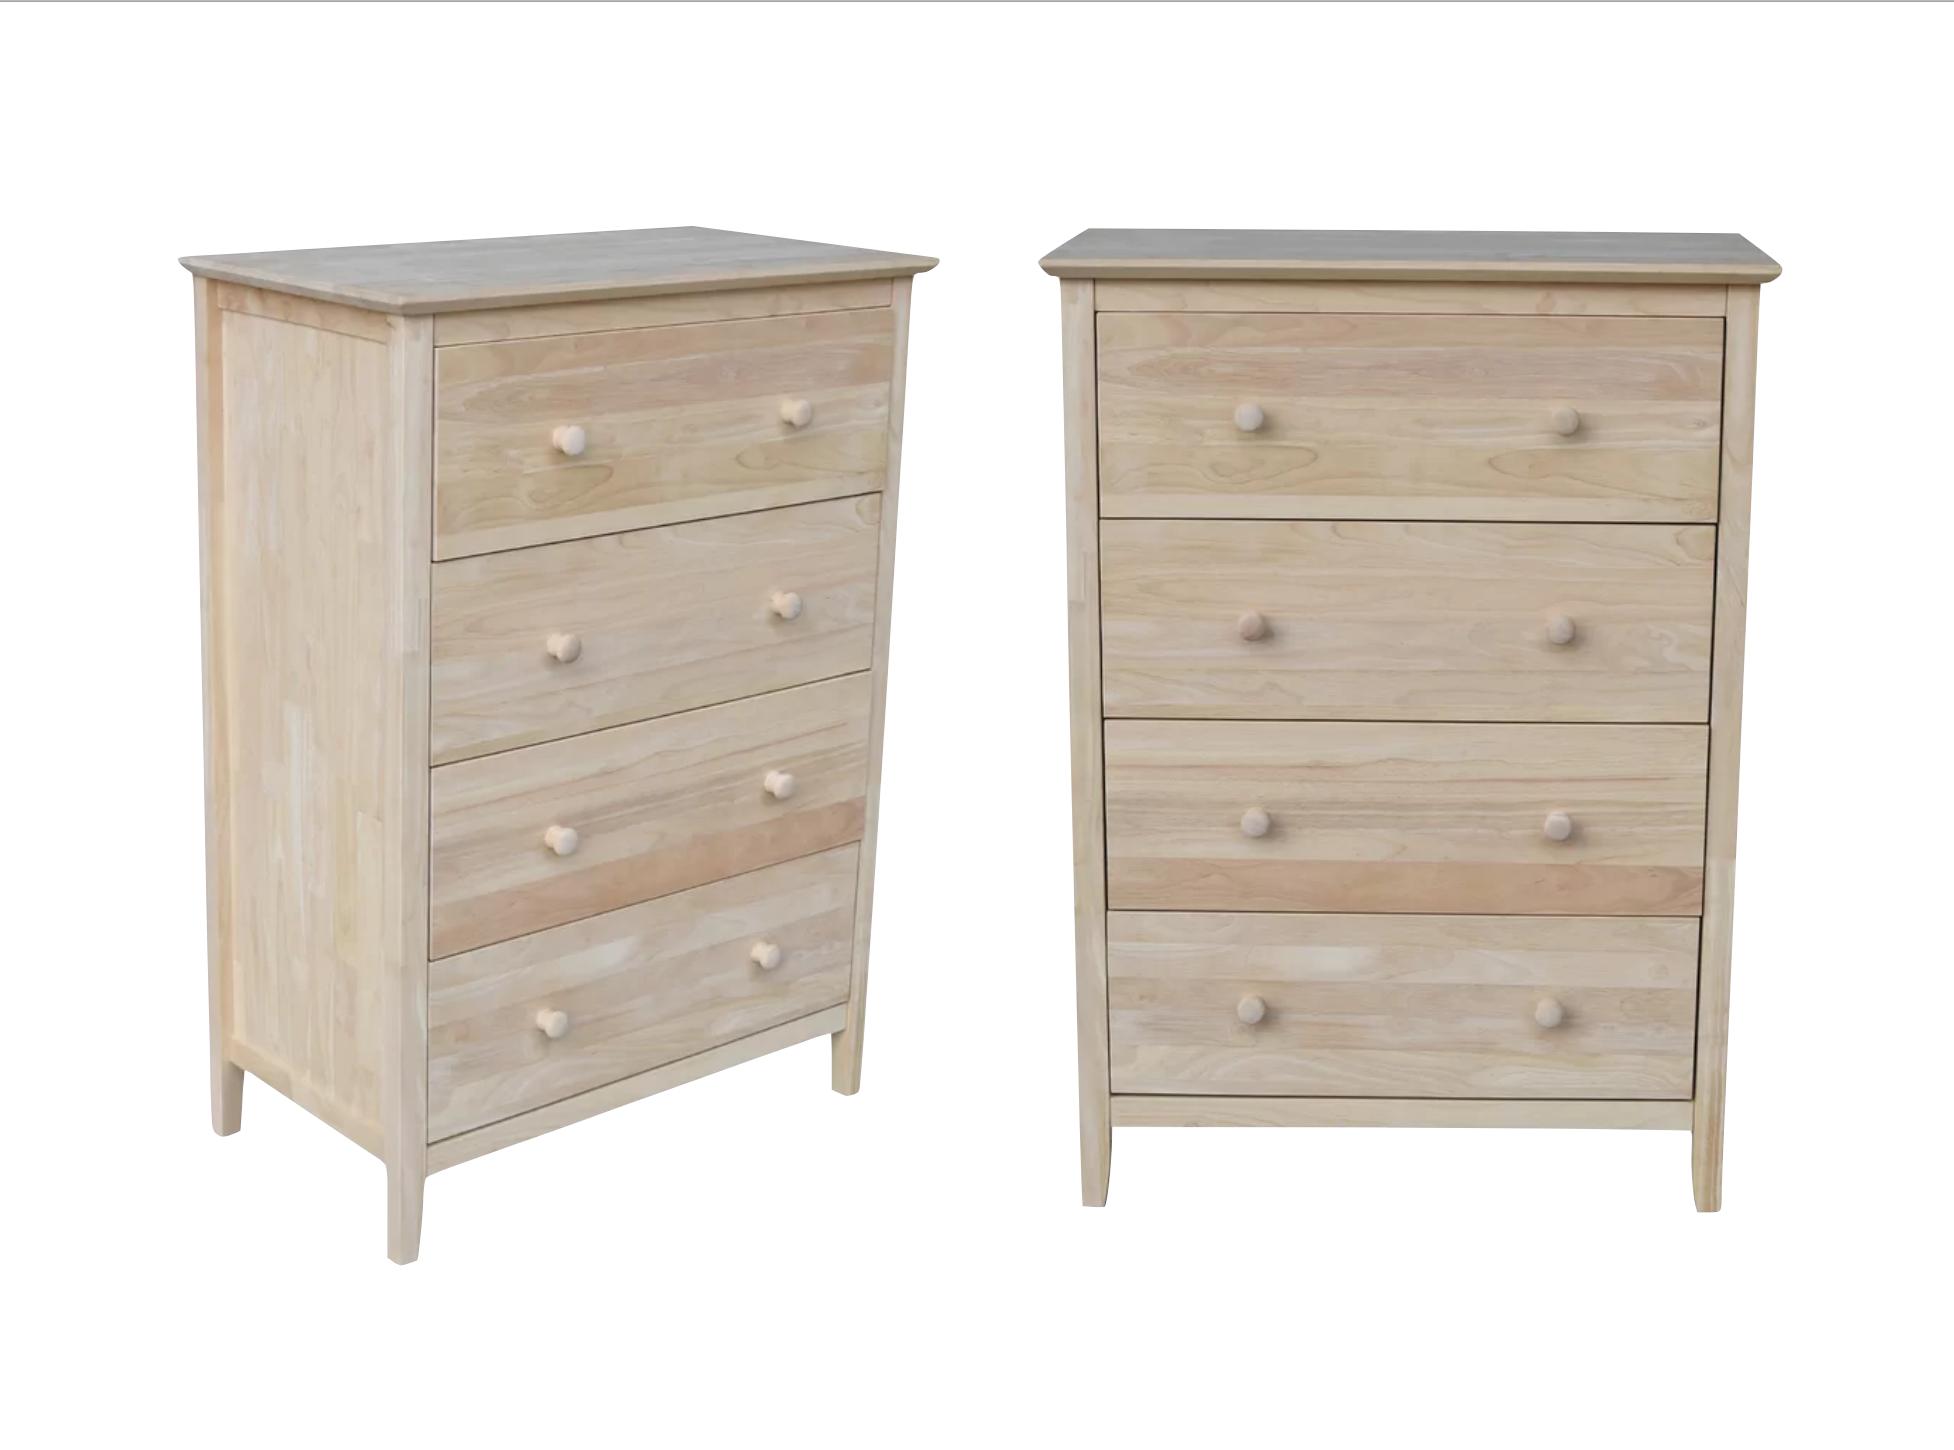 Here is the  original dresser  from Wayfair.